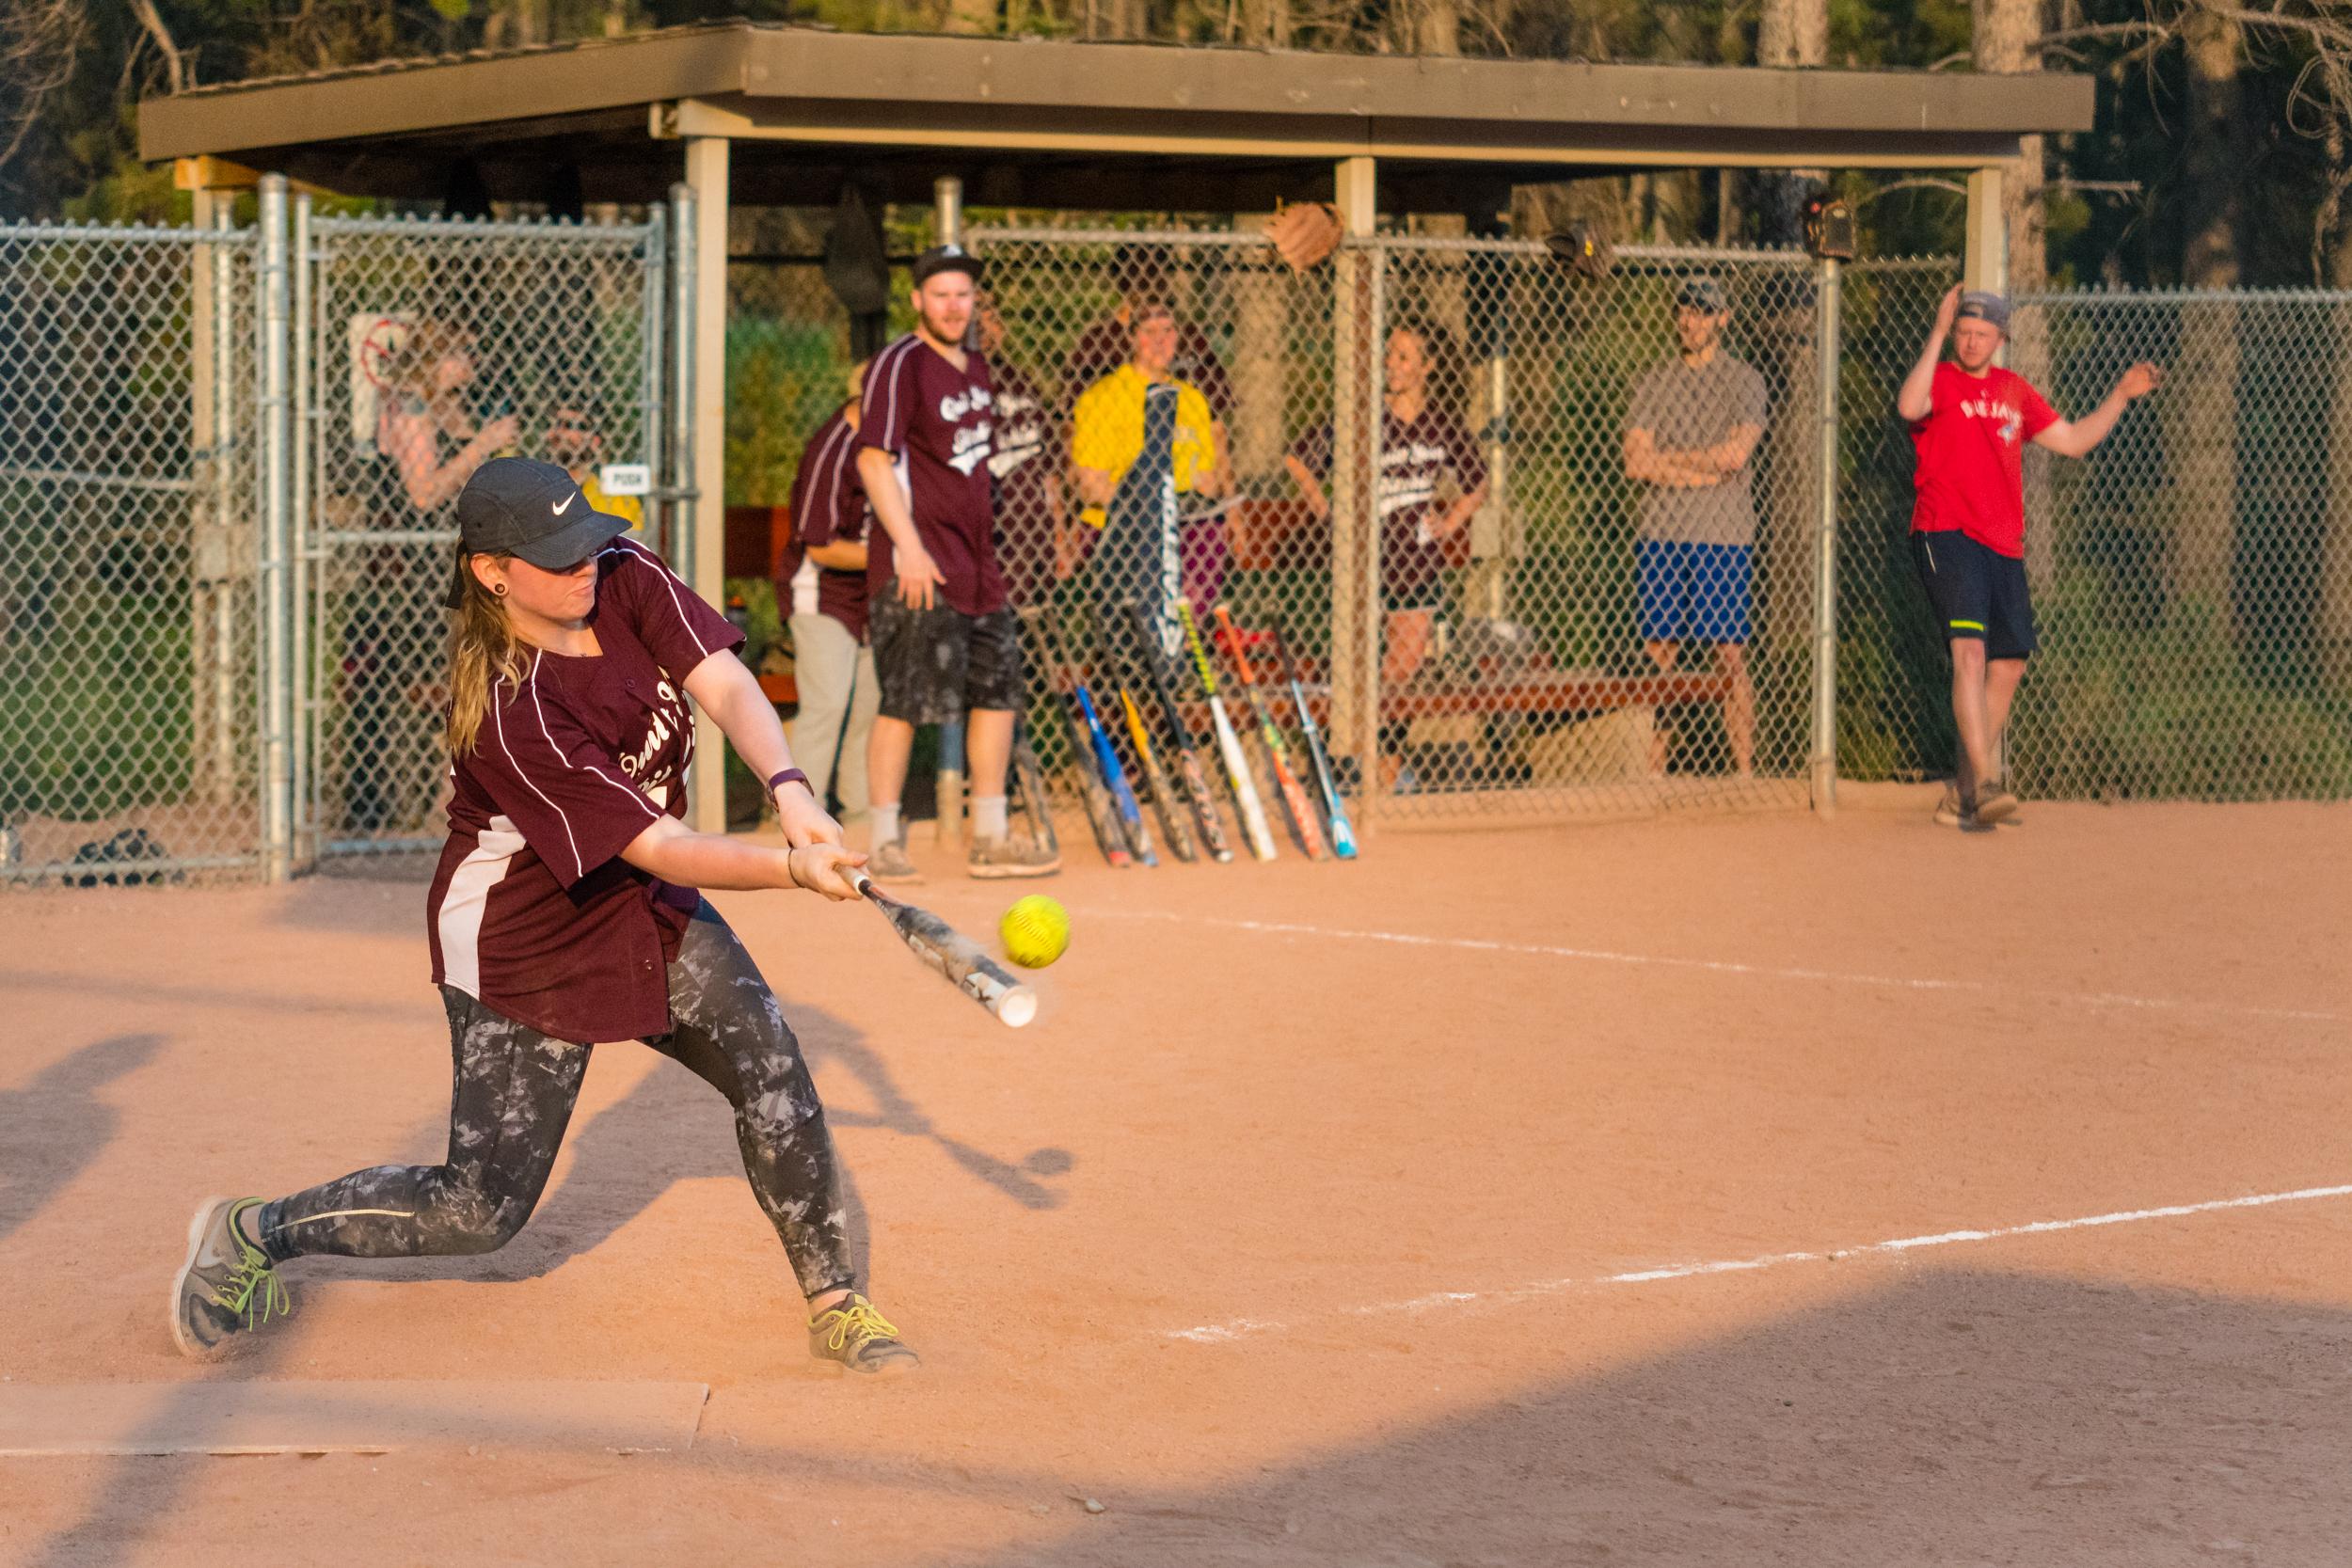 2017 08 01 Softball Quit vs Emerald-59.jpg